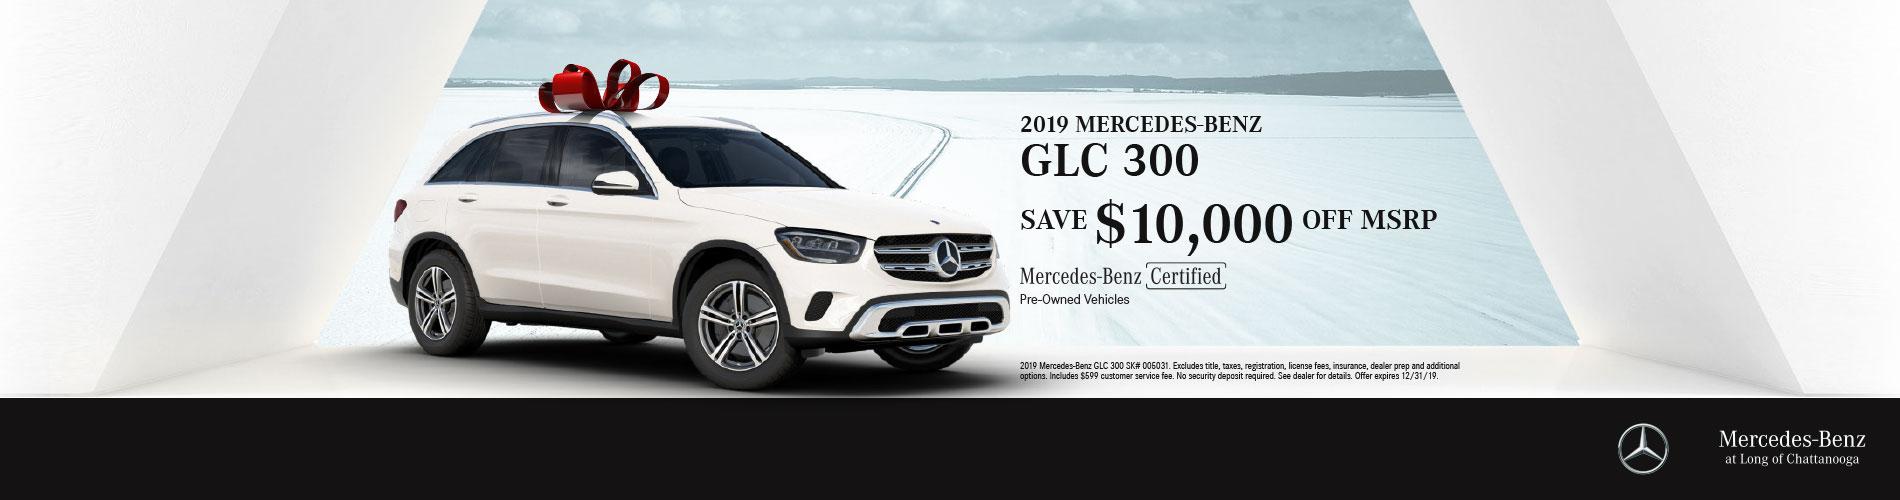 2019 Mercedes-Benz GLC 300 Special near Calhoun GA